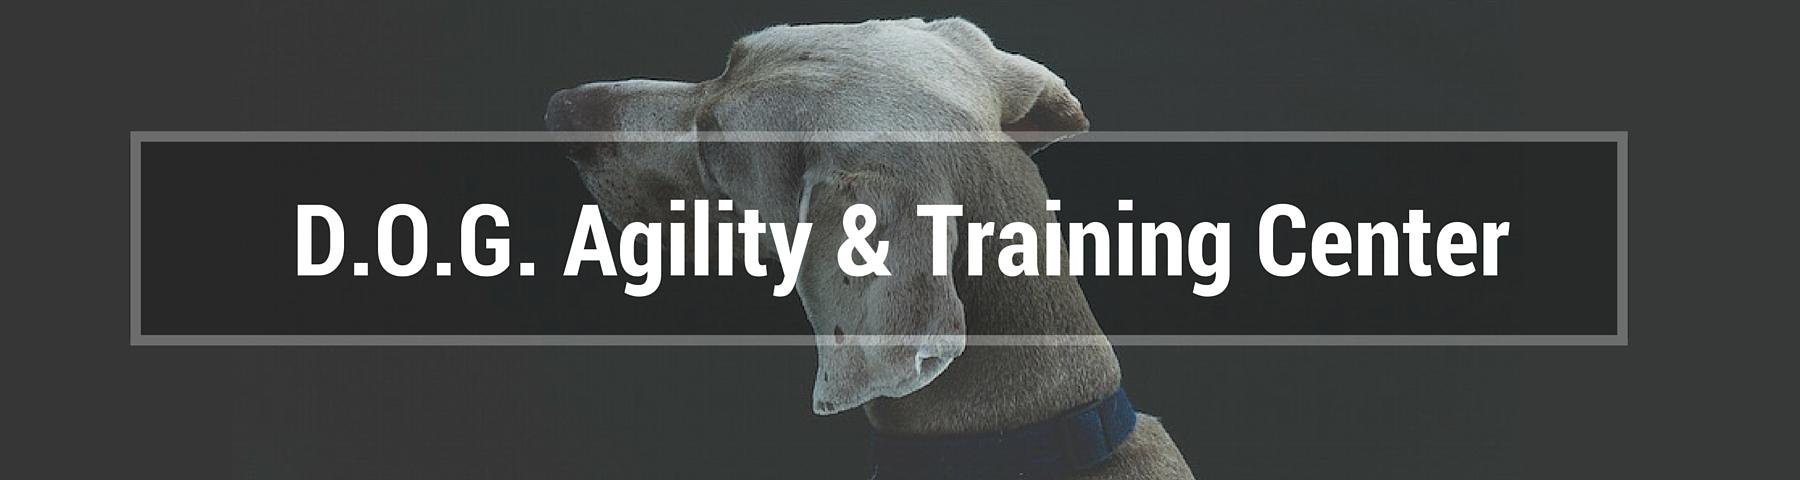 D.O.G. Agility and Training Center